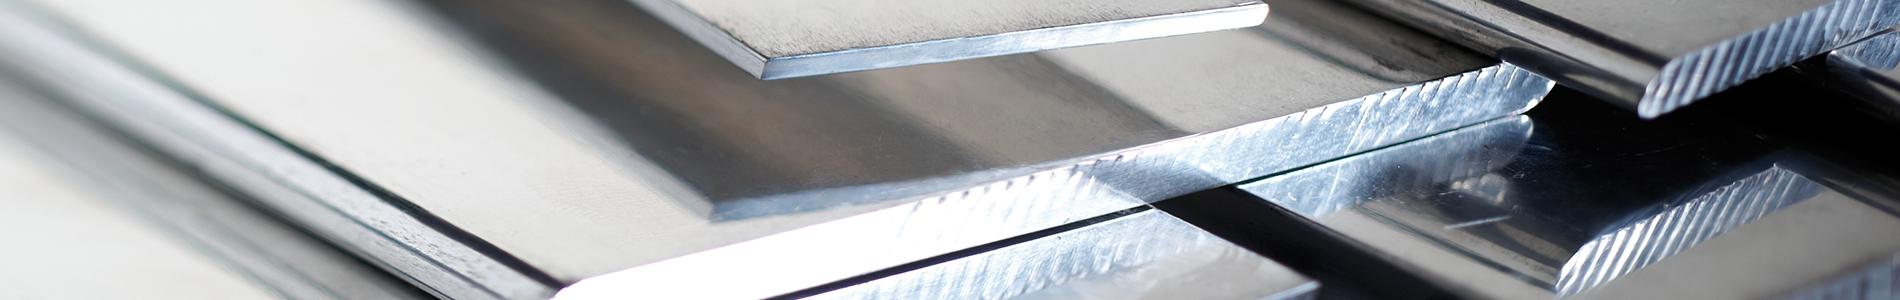 Aluminio extruido